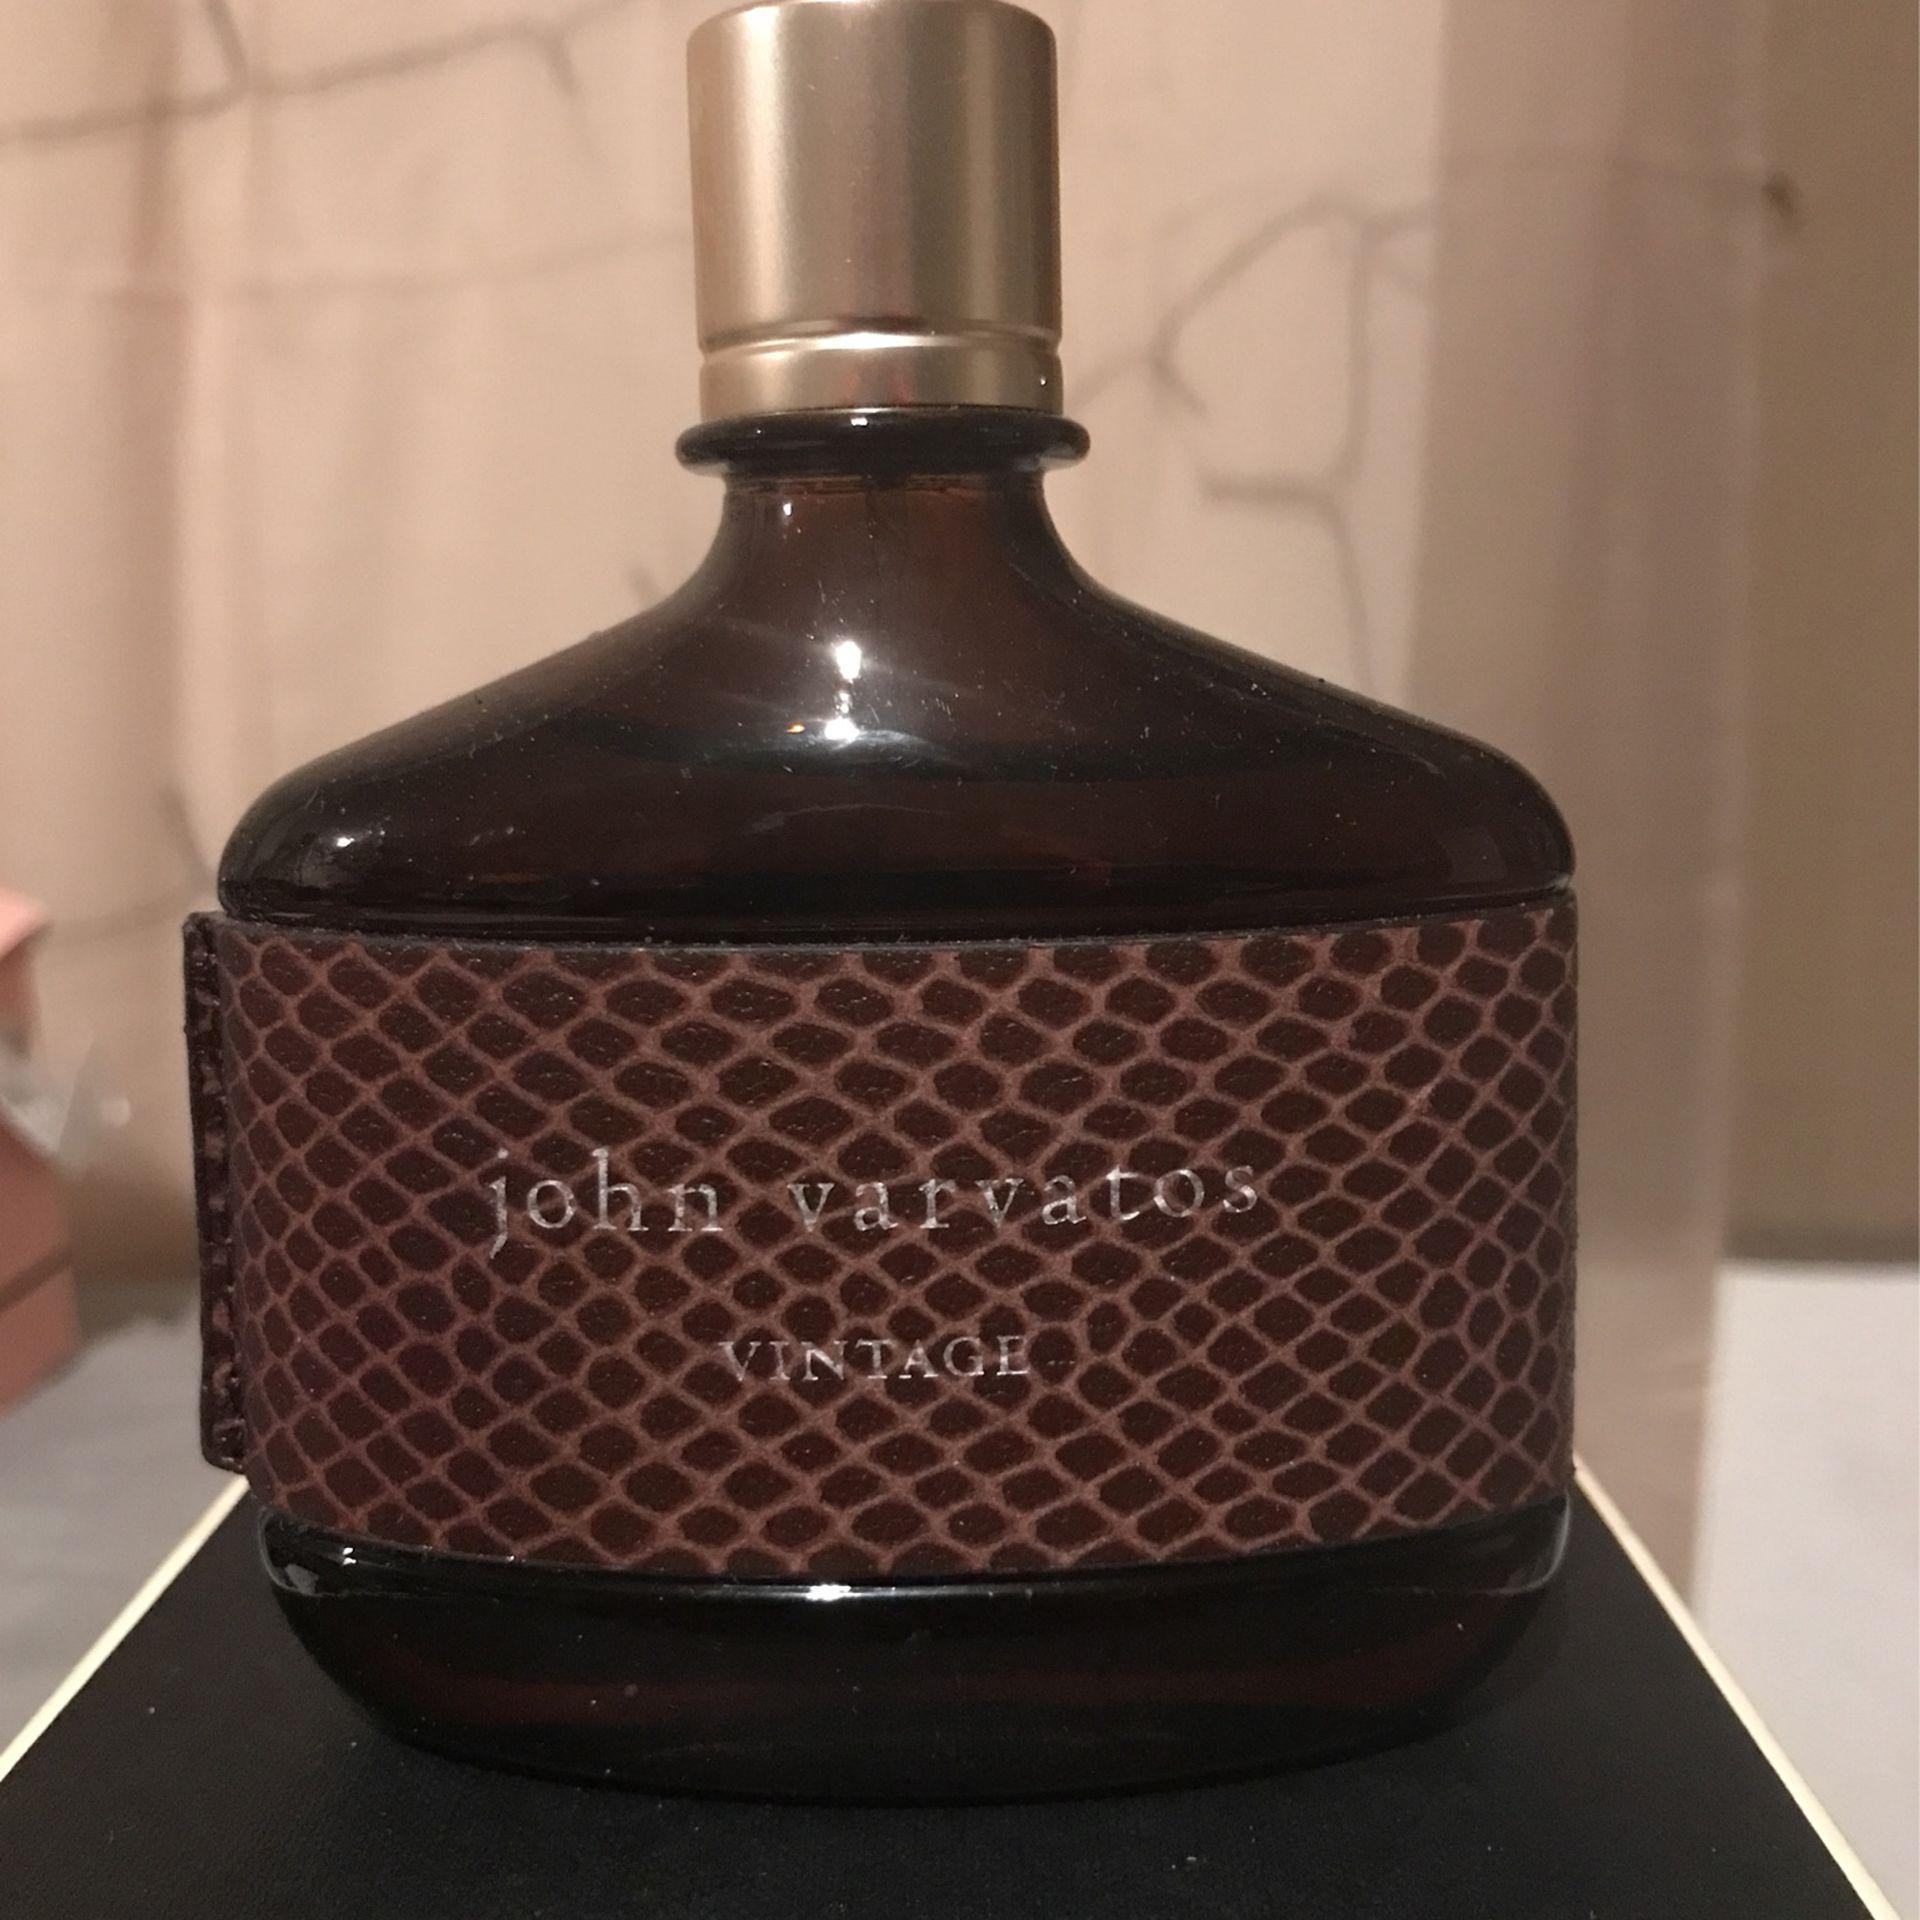 John Varvatos men's cologne 2.5 ounce